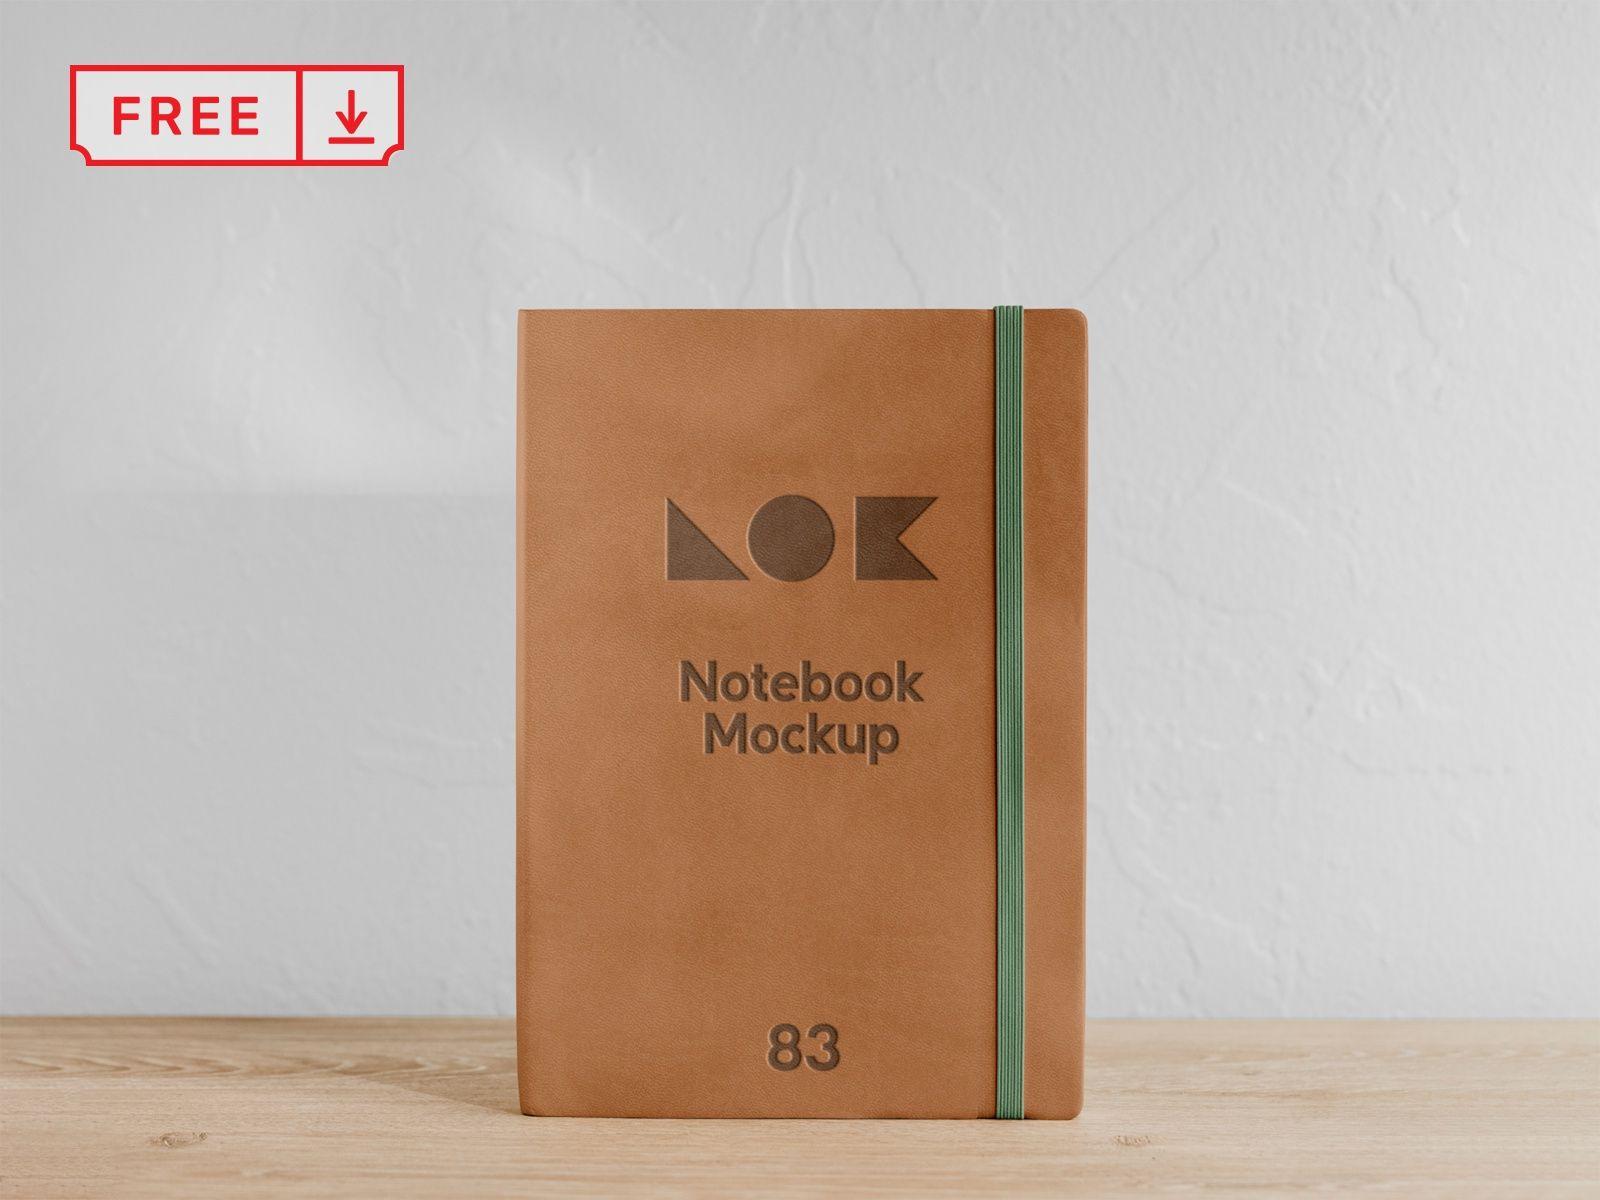 Free Notebook Mockup In 2021 Free Notebook Notebook Free